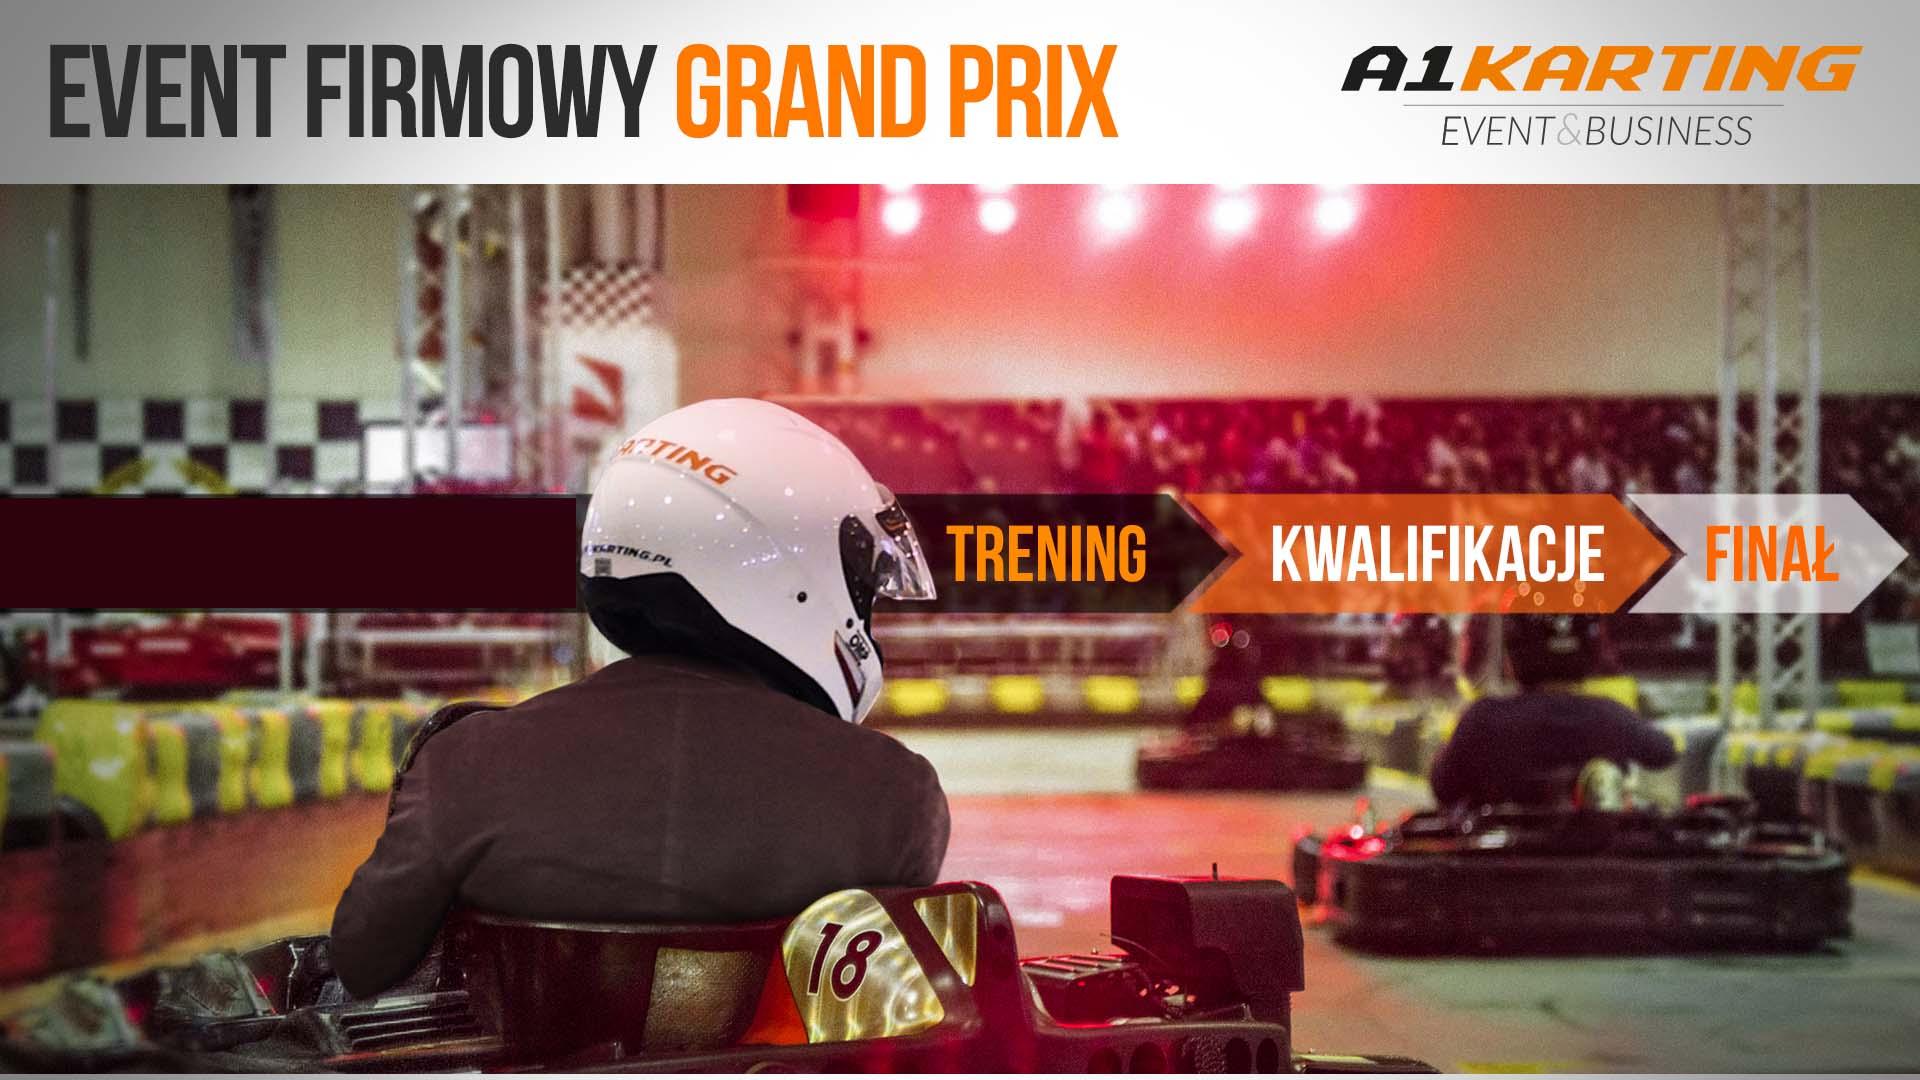 A1Karting Grand Prix